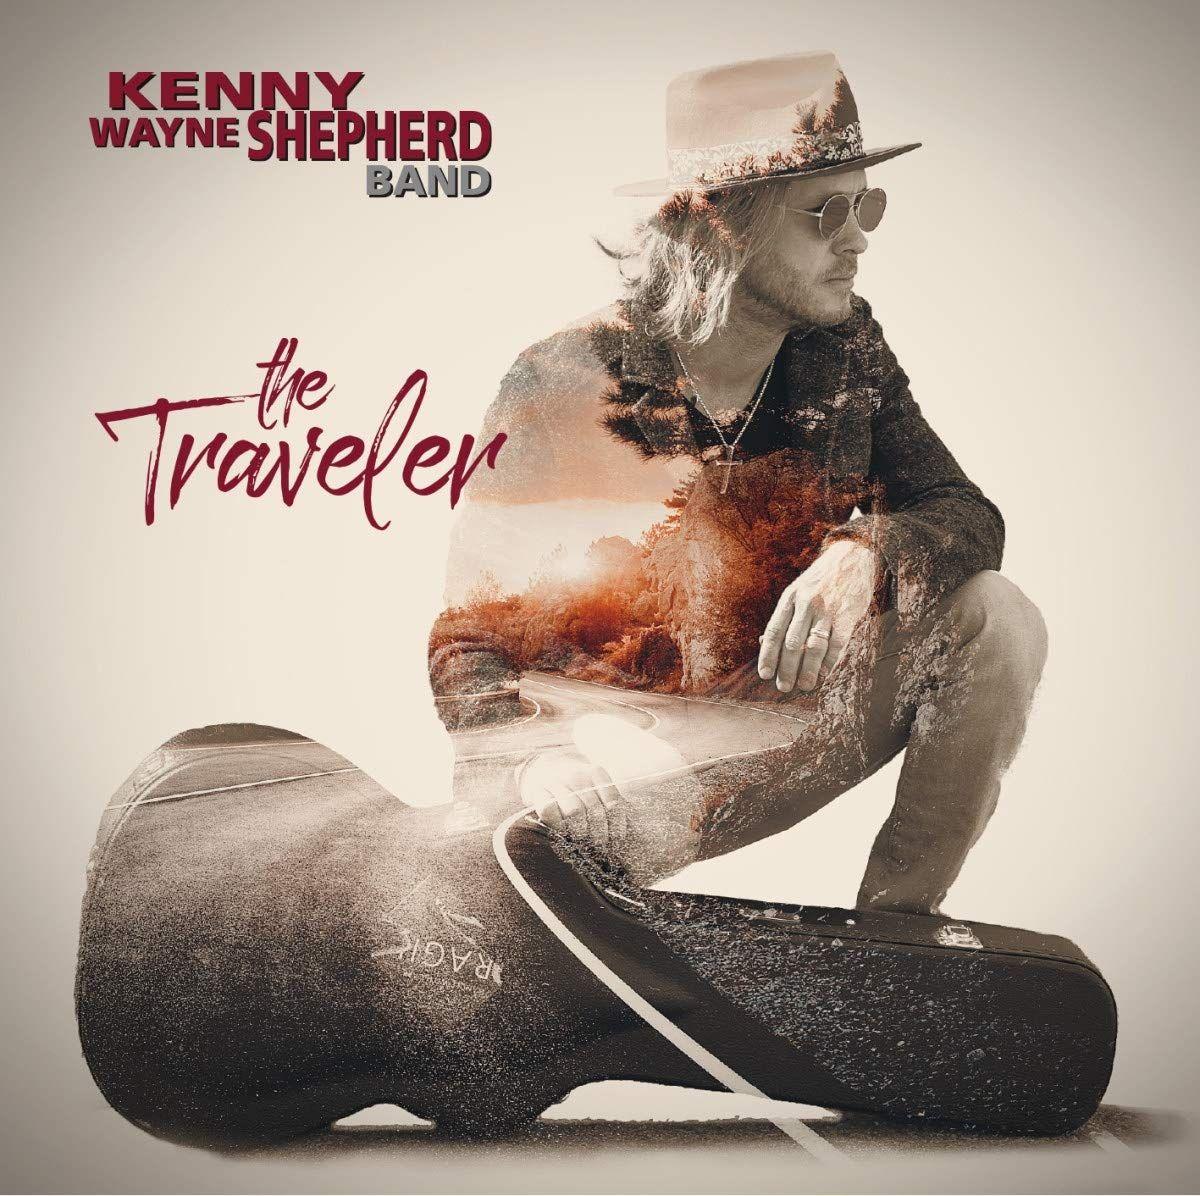 Shepherd Kenny Wayne – Traveler